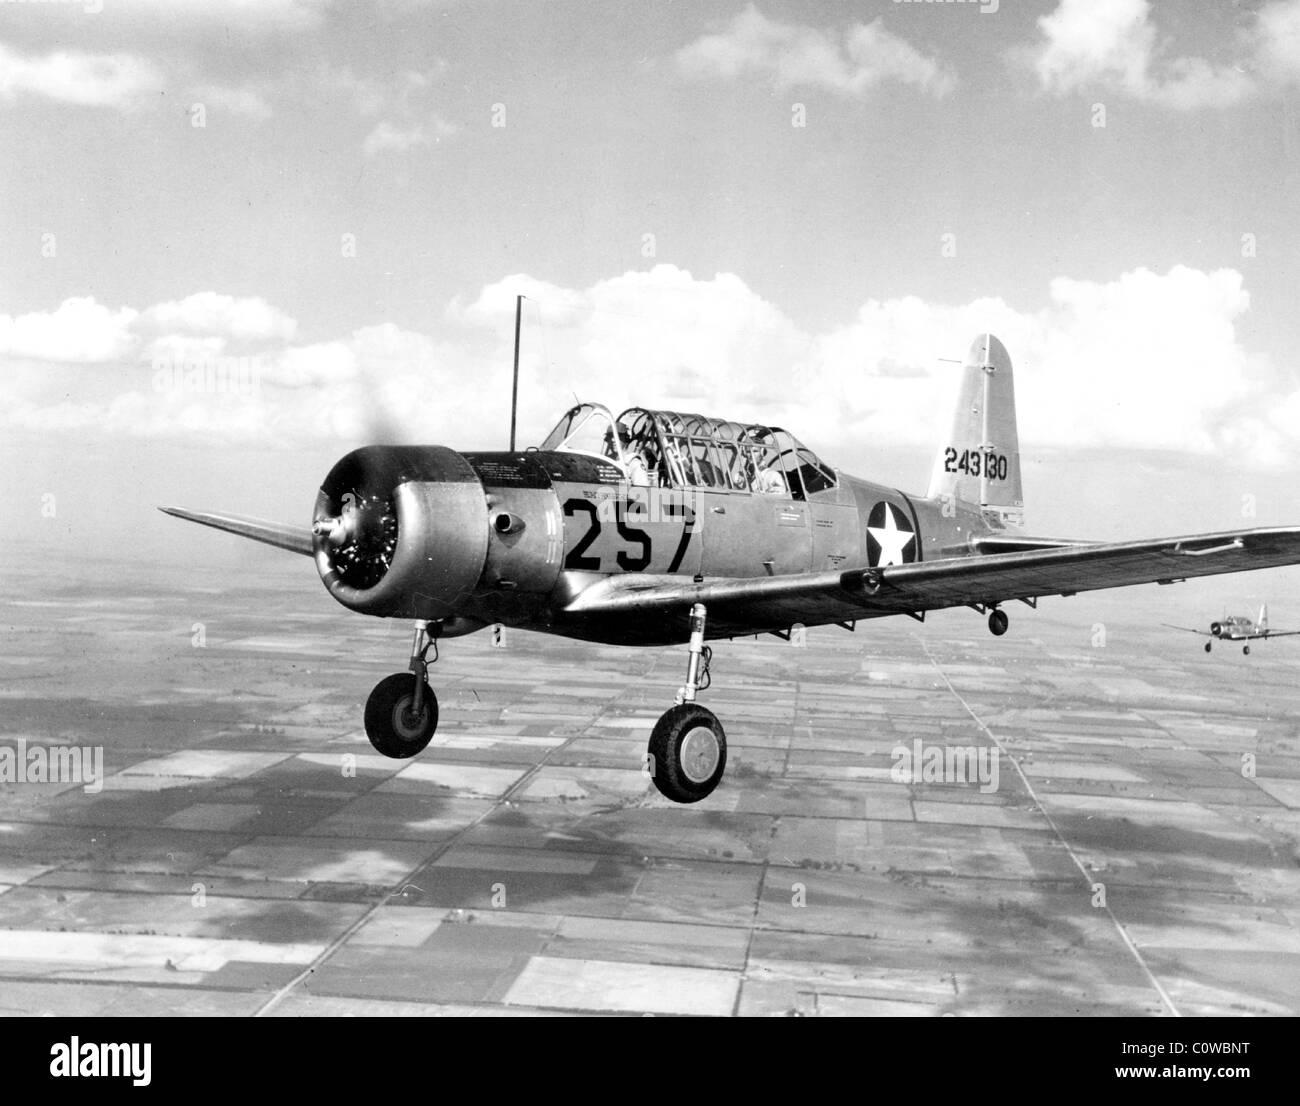 Vultee BT-13 Valiant was an American World War II-era basic trainer aircraft. - Stock Image